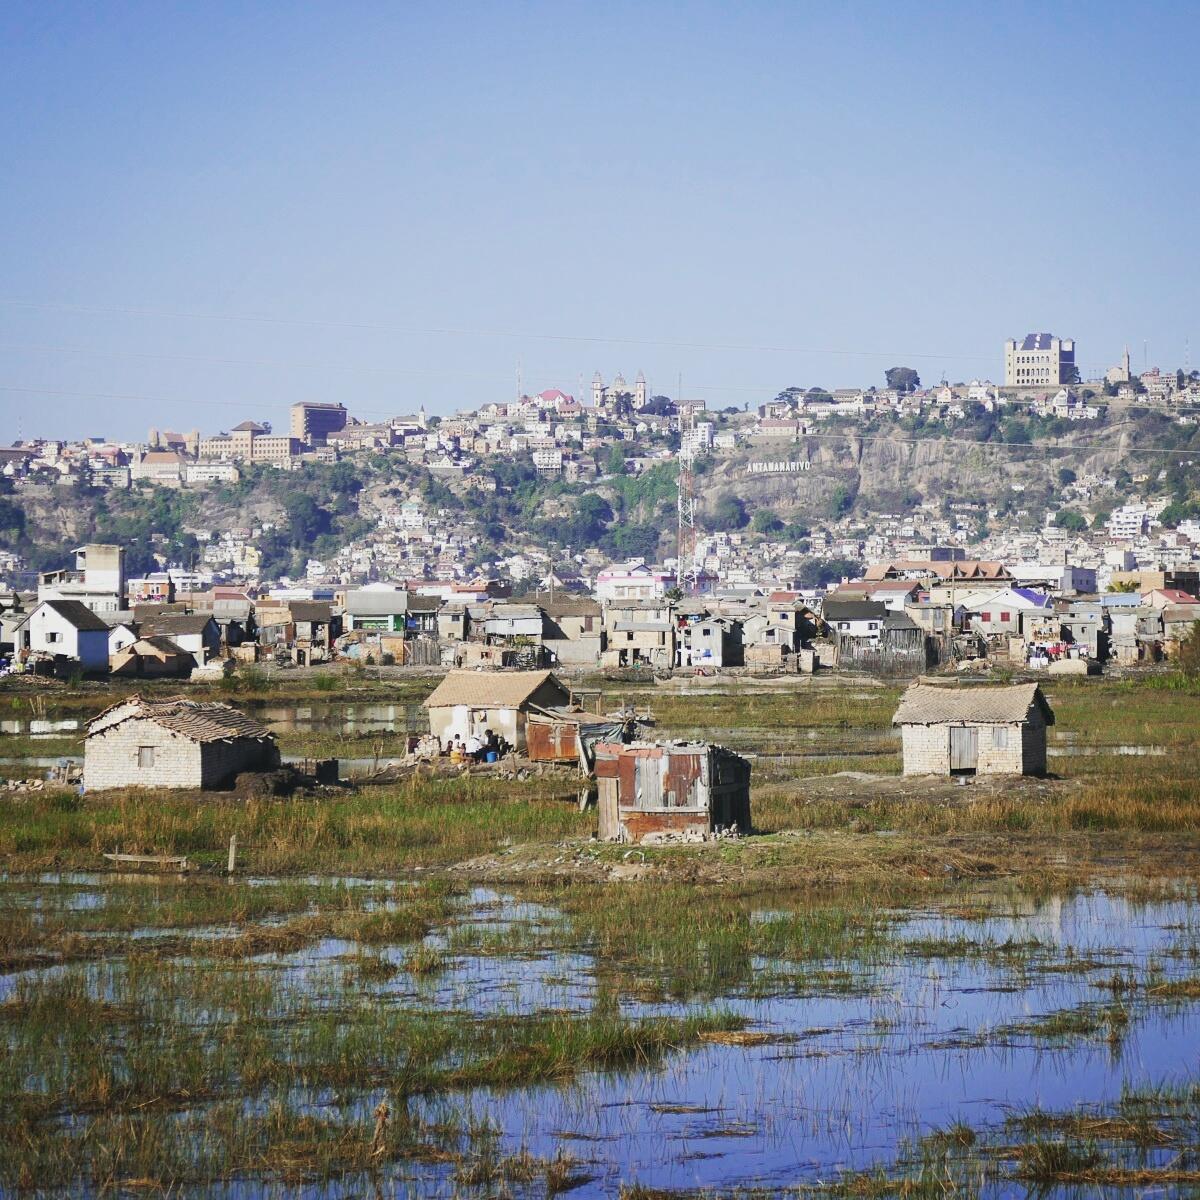 A marsh on the outskirts of Antananarivo provides good habitat for herons and egrets. Noah Strycker